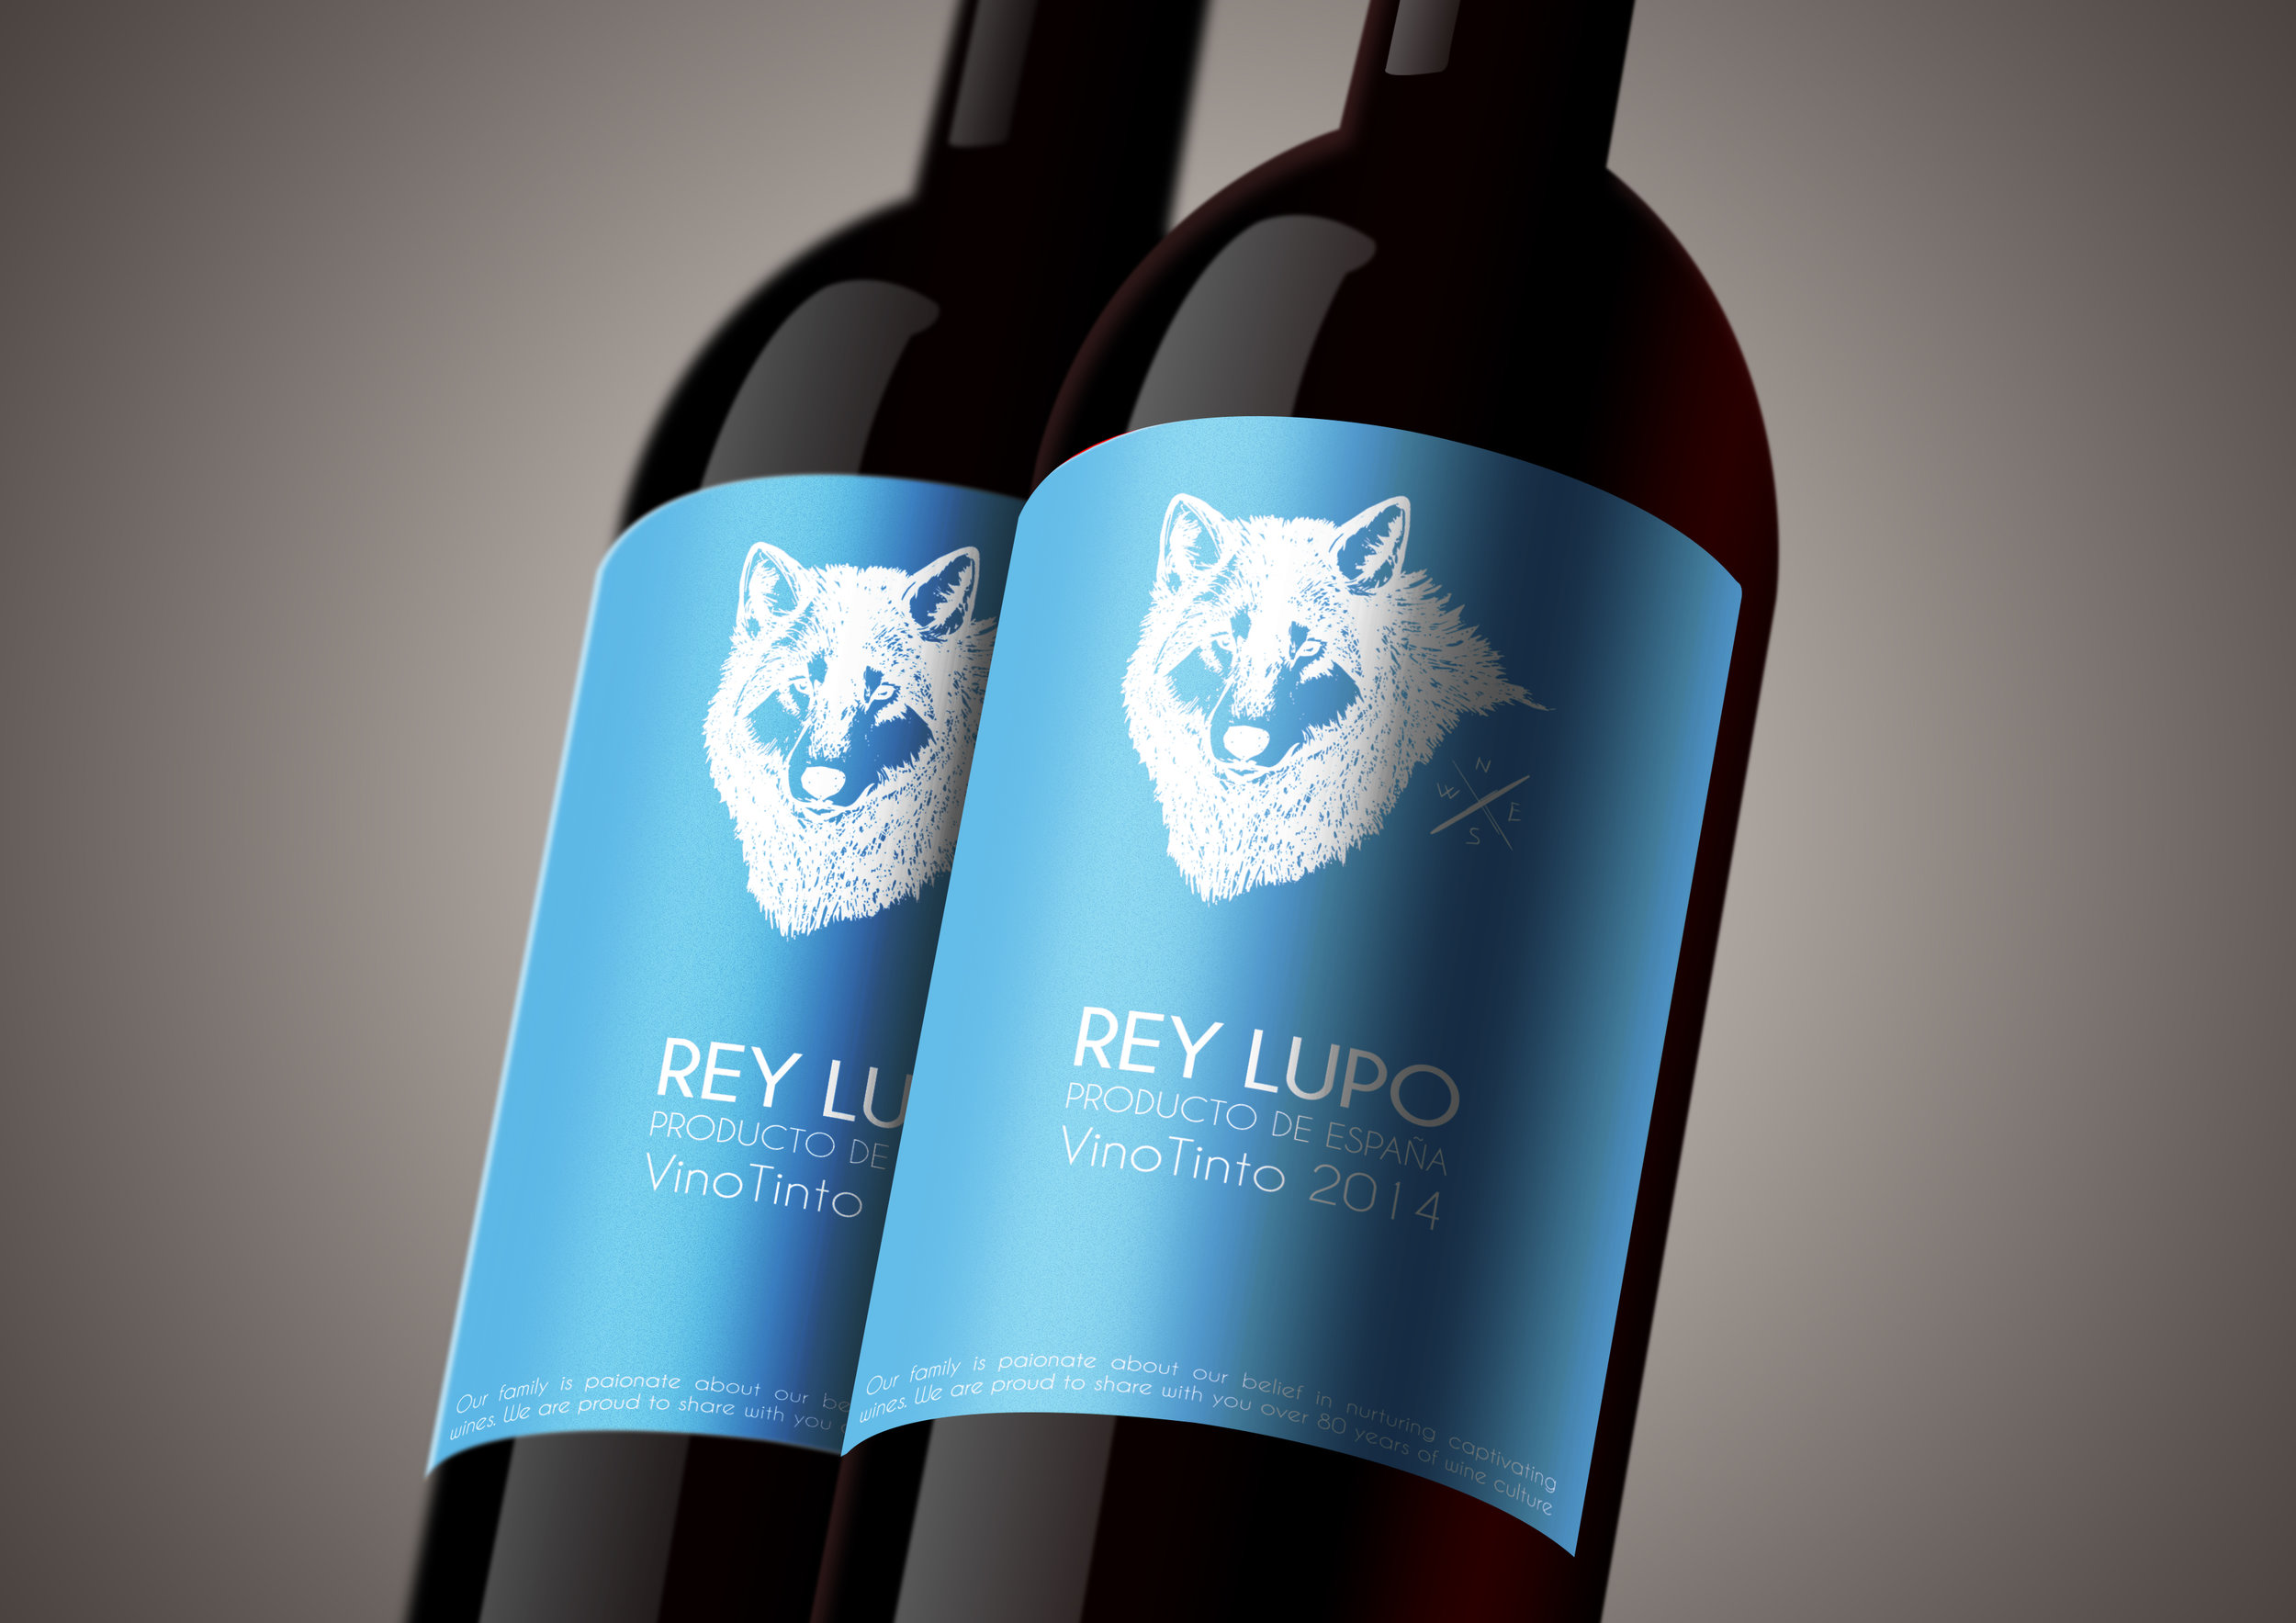 Rey Lupo 2 bottle shot.jpg